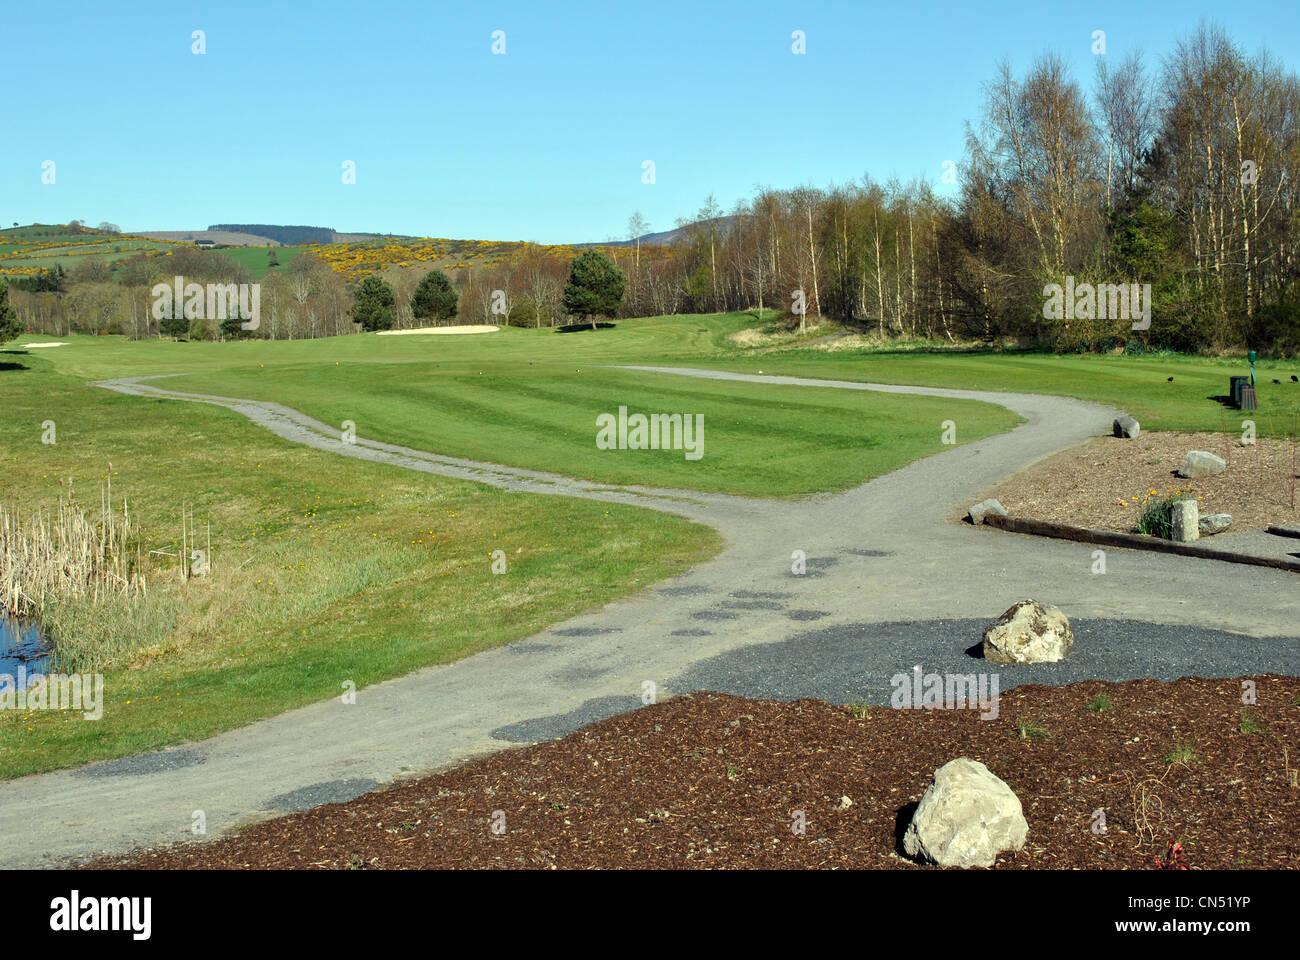 parkland golf course - Stock Image